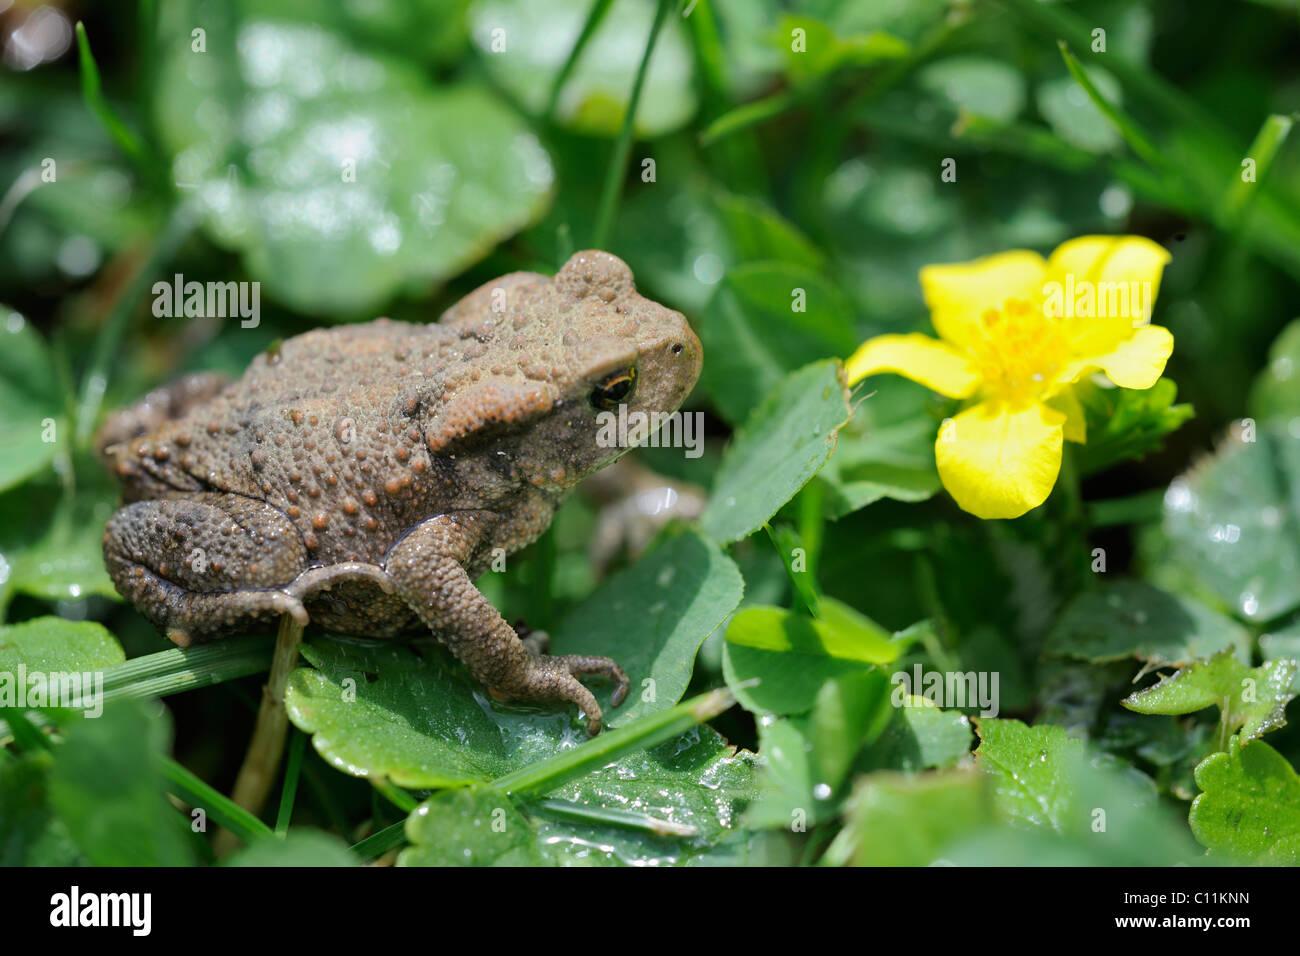 Young Common Toad (Bufo bufo), Waldviertel region, Lower Austria, Austria, Europe Stock Photo